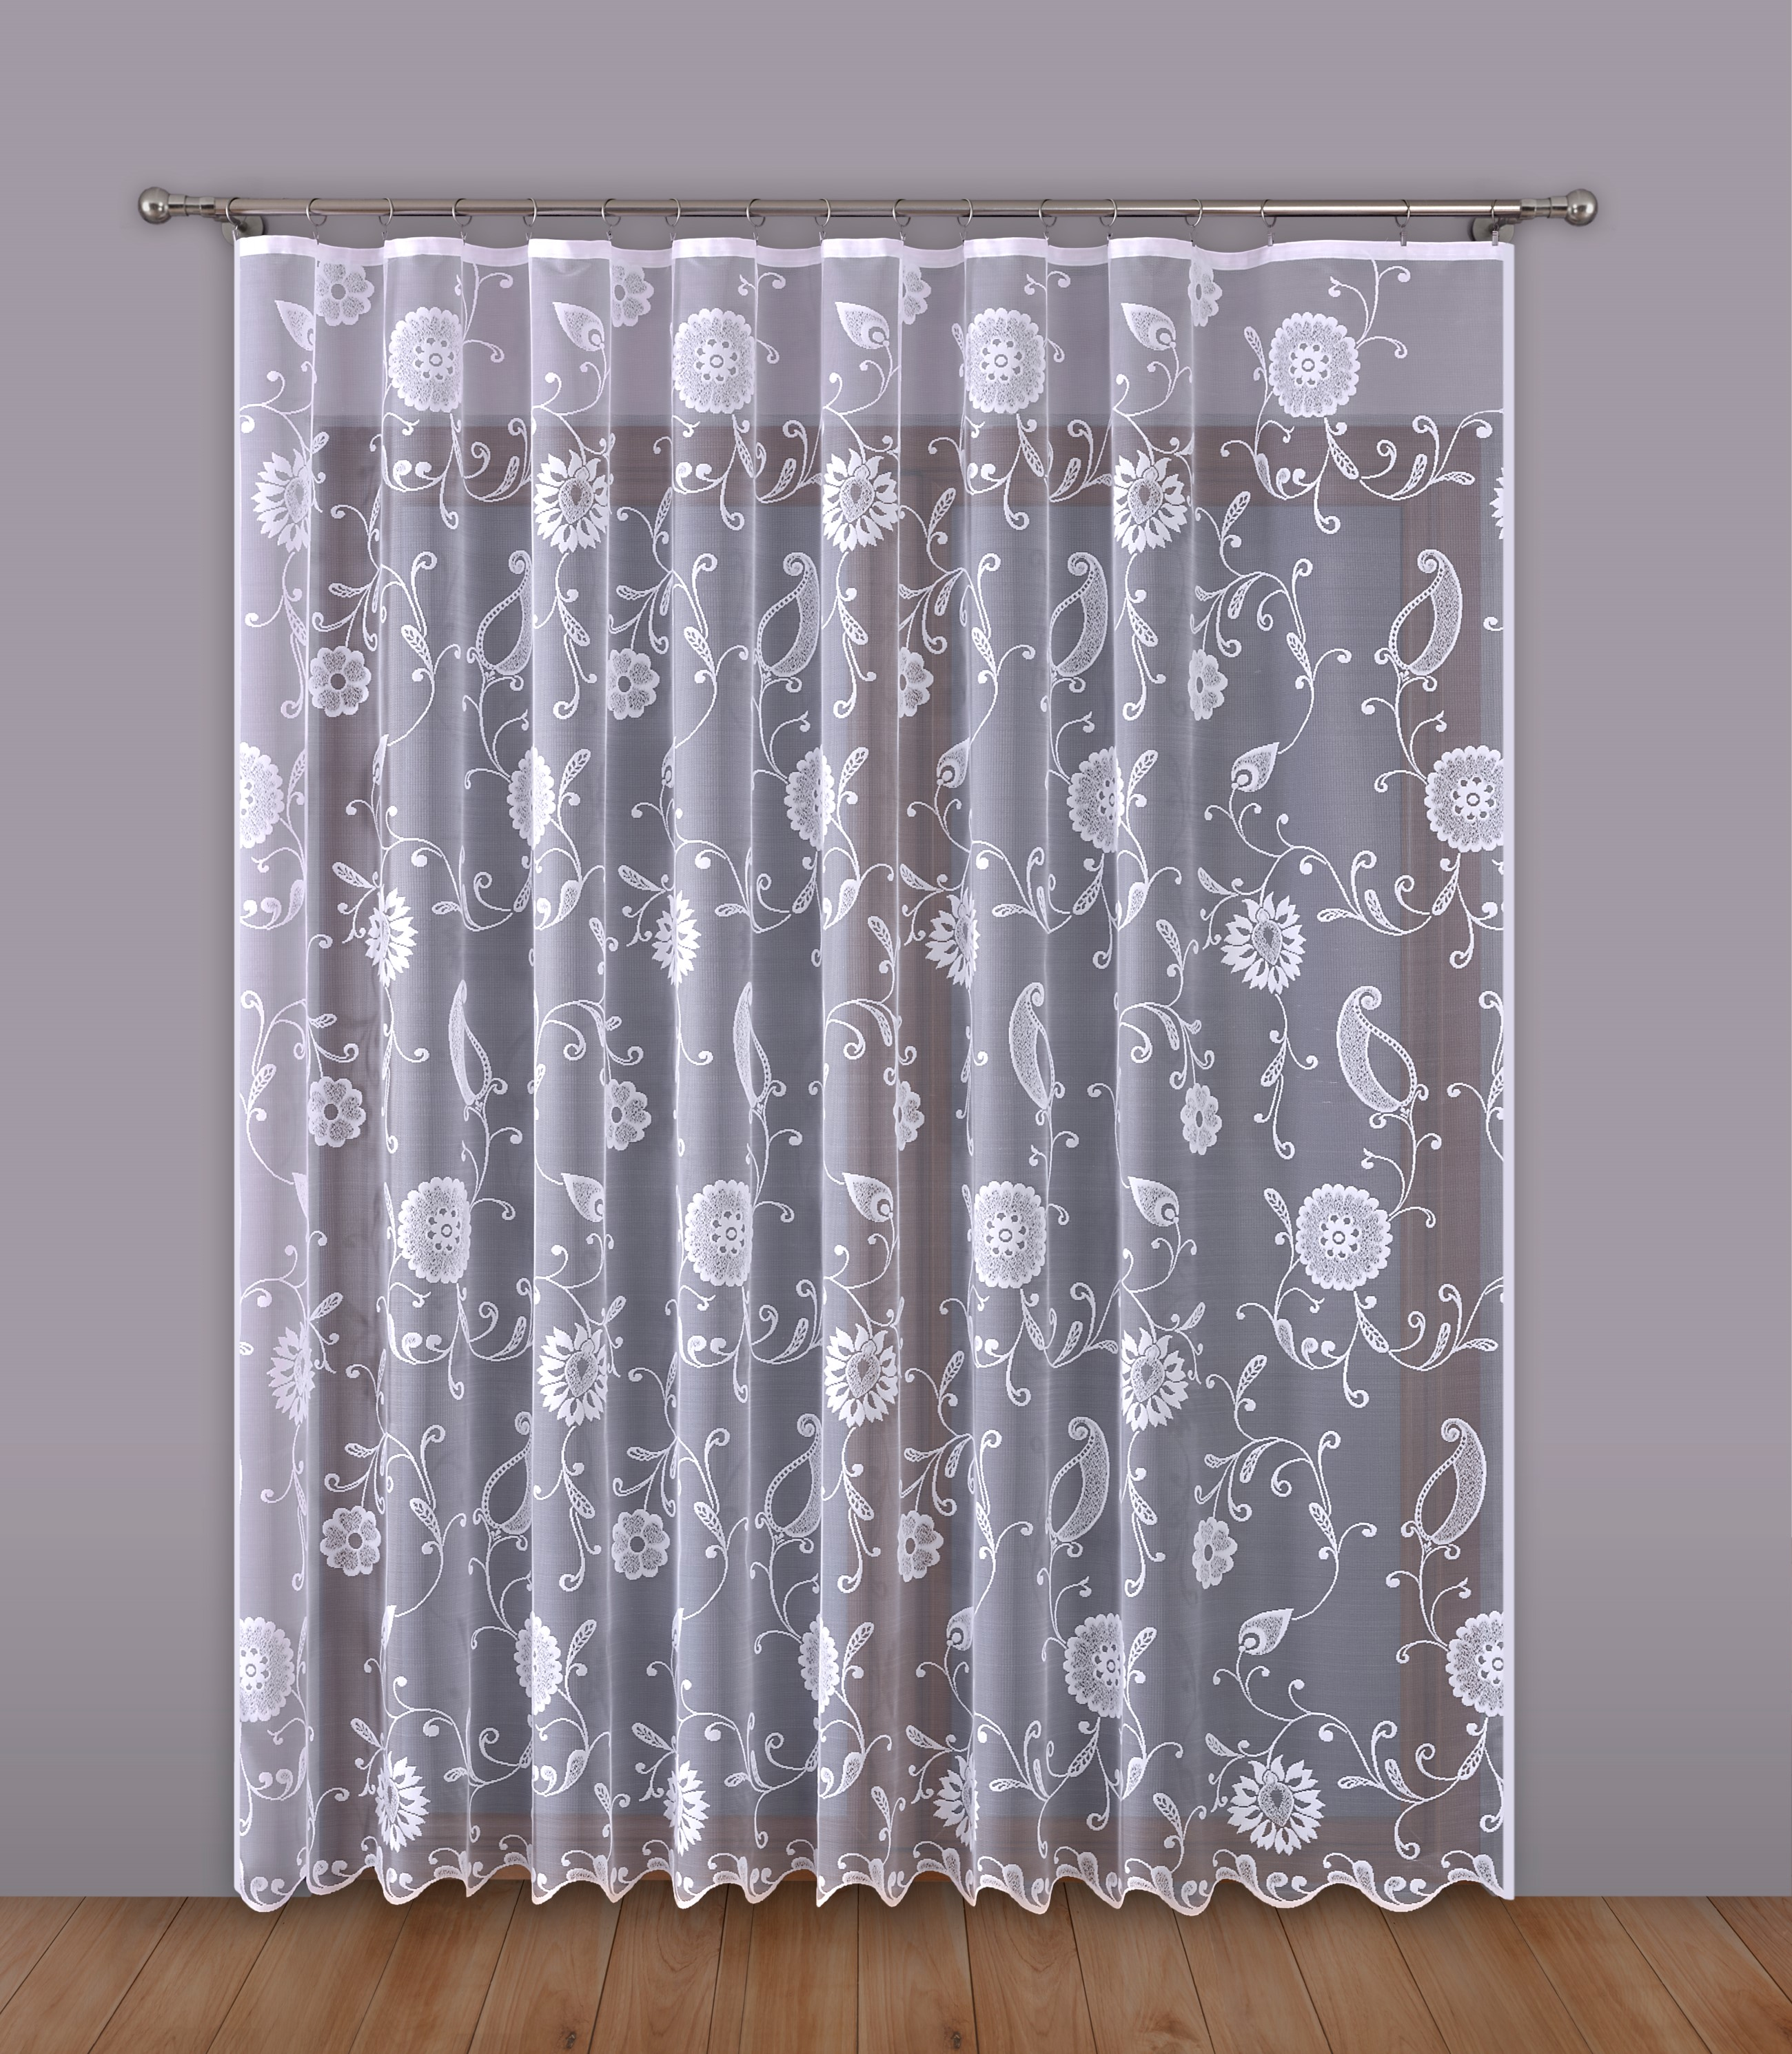 Шторы Primavera Классические шторы Gerry Цвет: Белый шторы kauffort классические шторы barolo